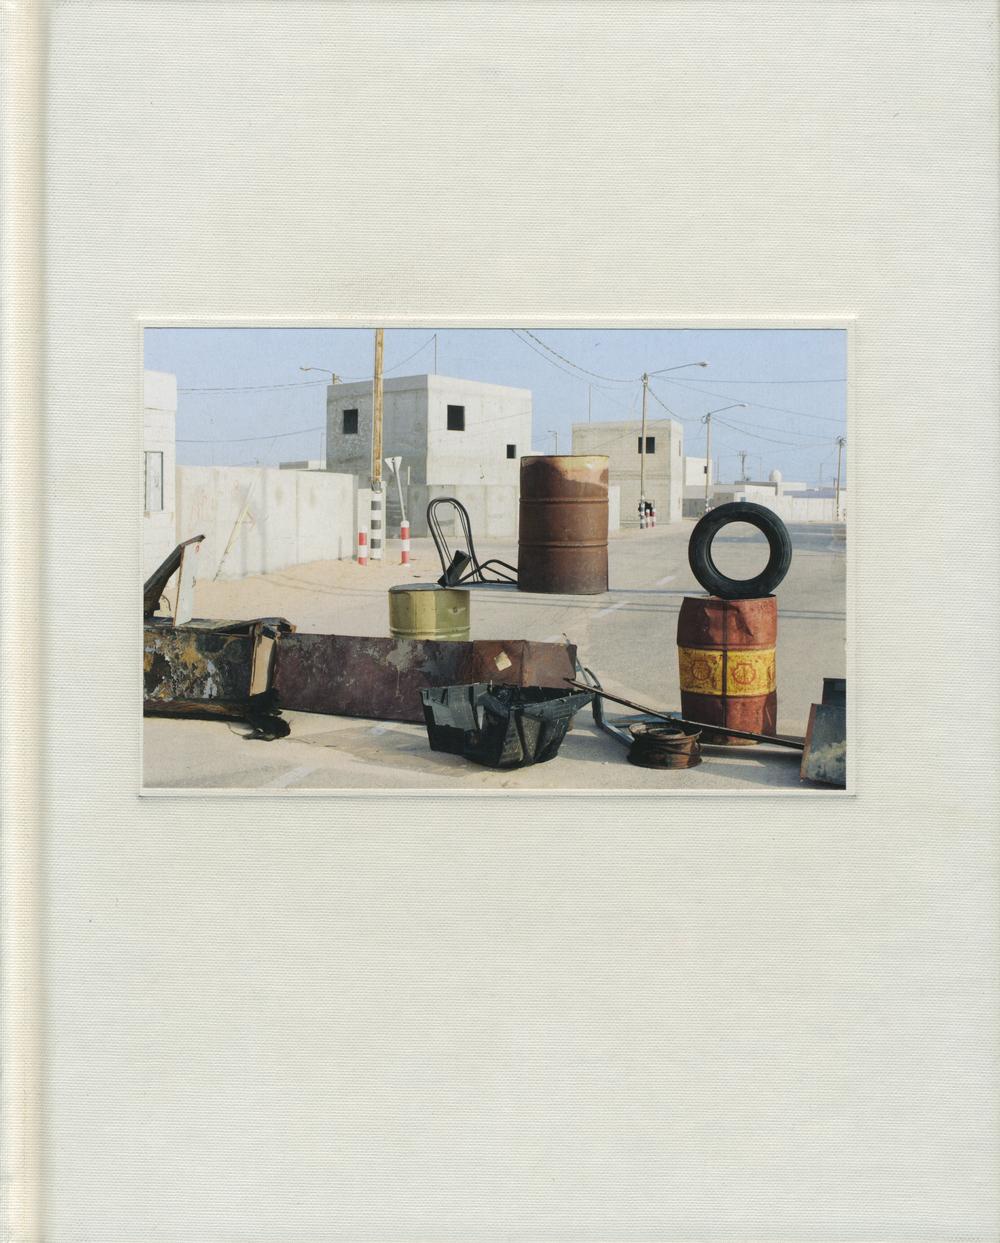 Martin Kollar Field Trip MACK books 76 Seiten, 20 cm x 25 cm Hardcover /Englisch Erscheinungsdatum: Oktober 2013 40,00 €